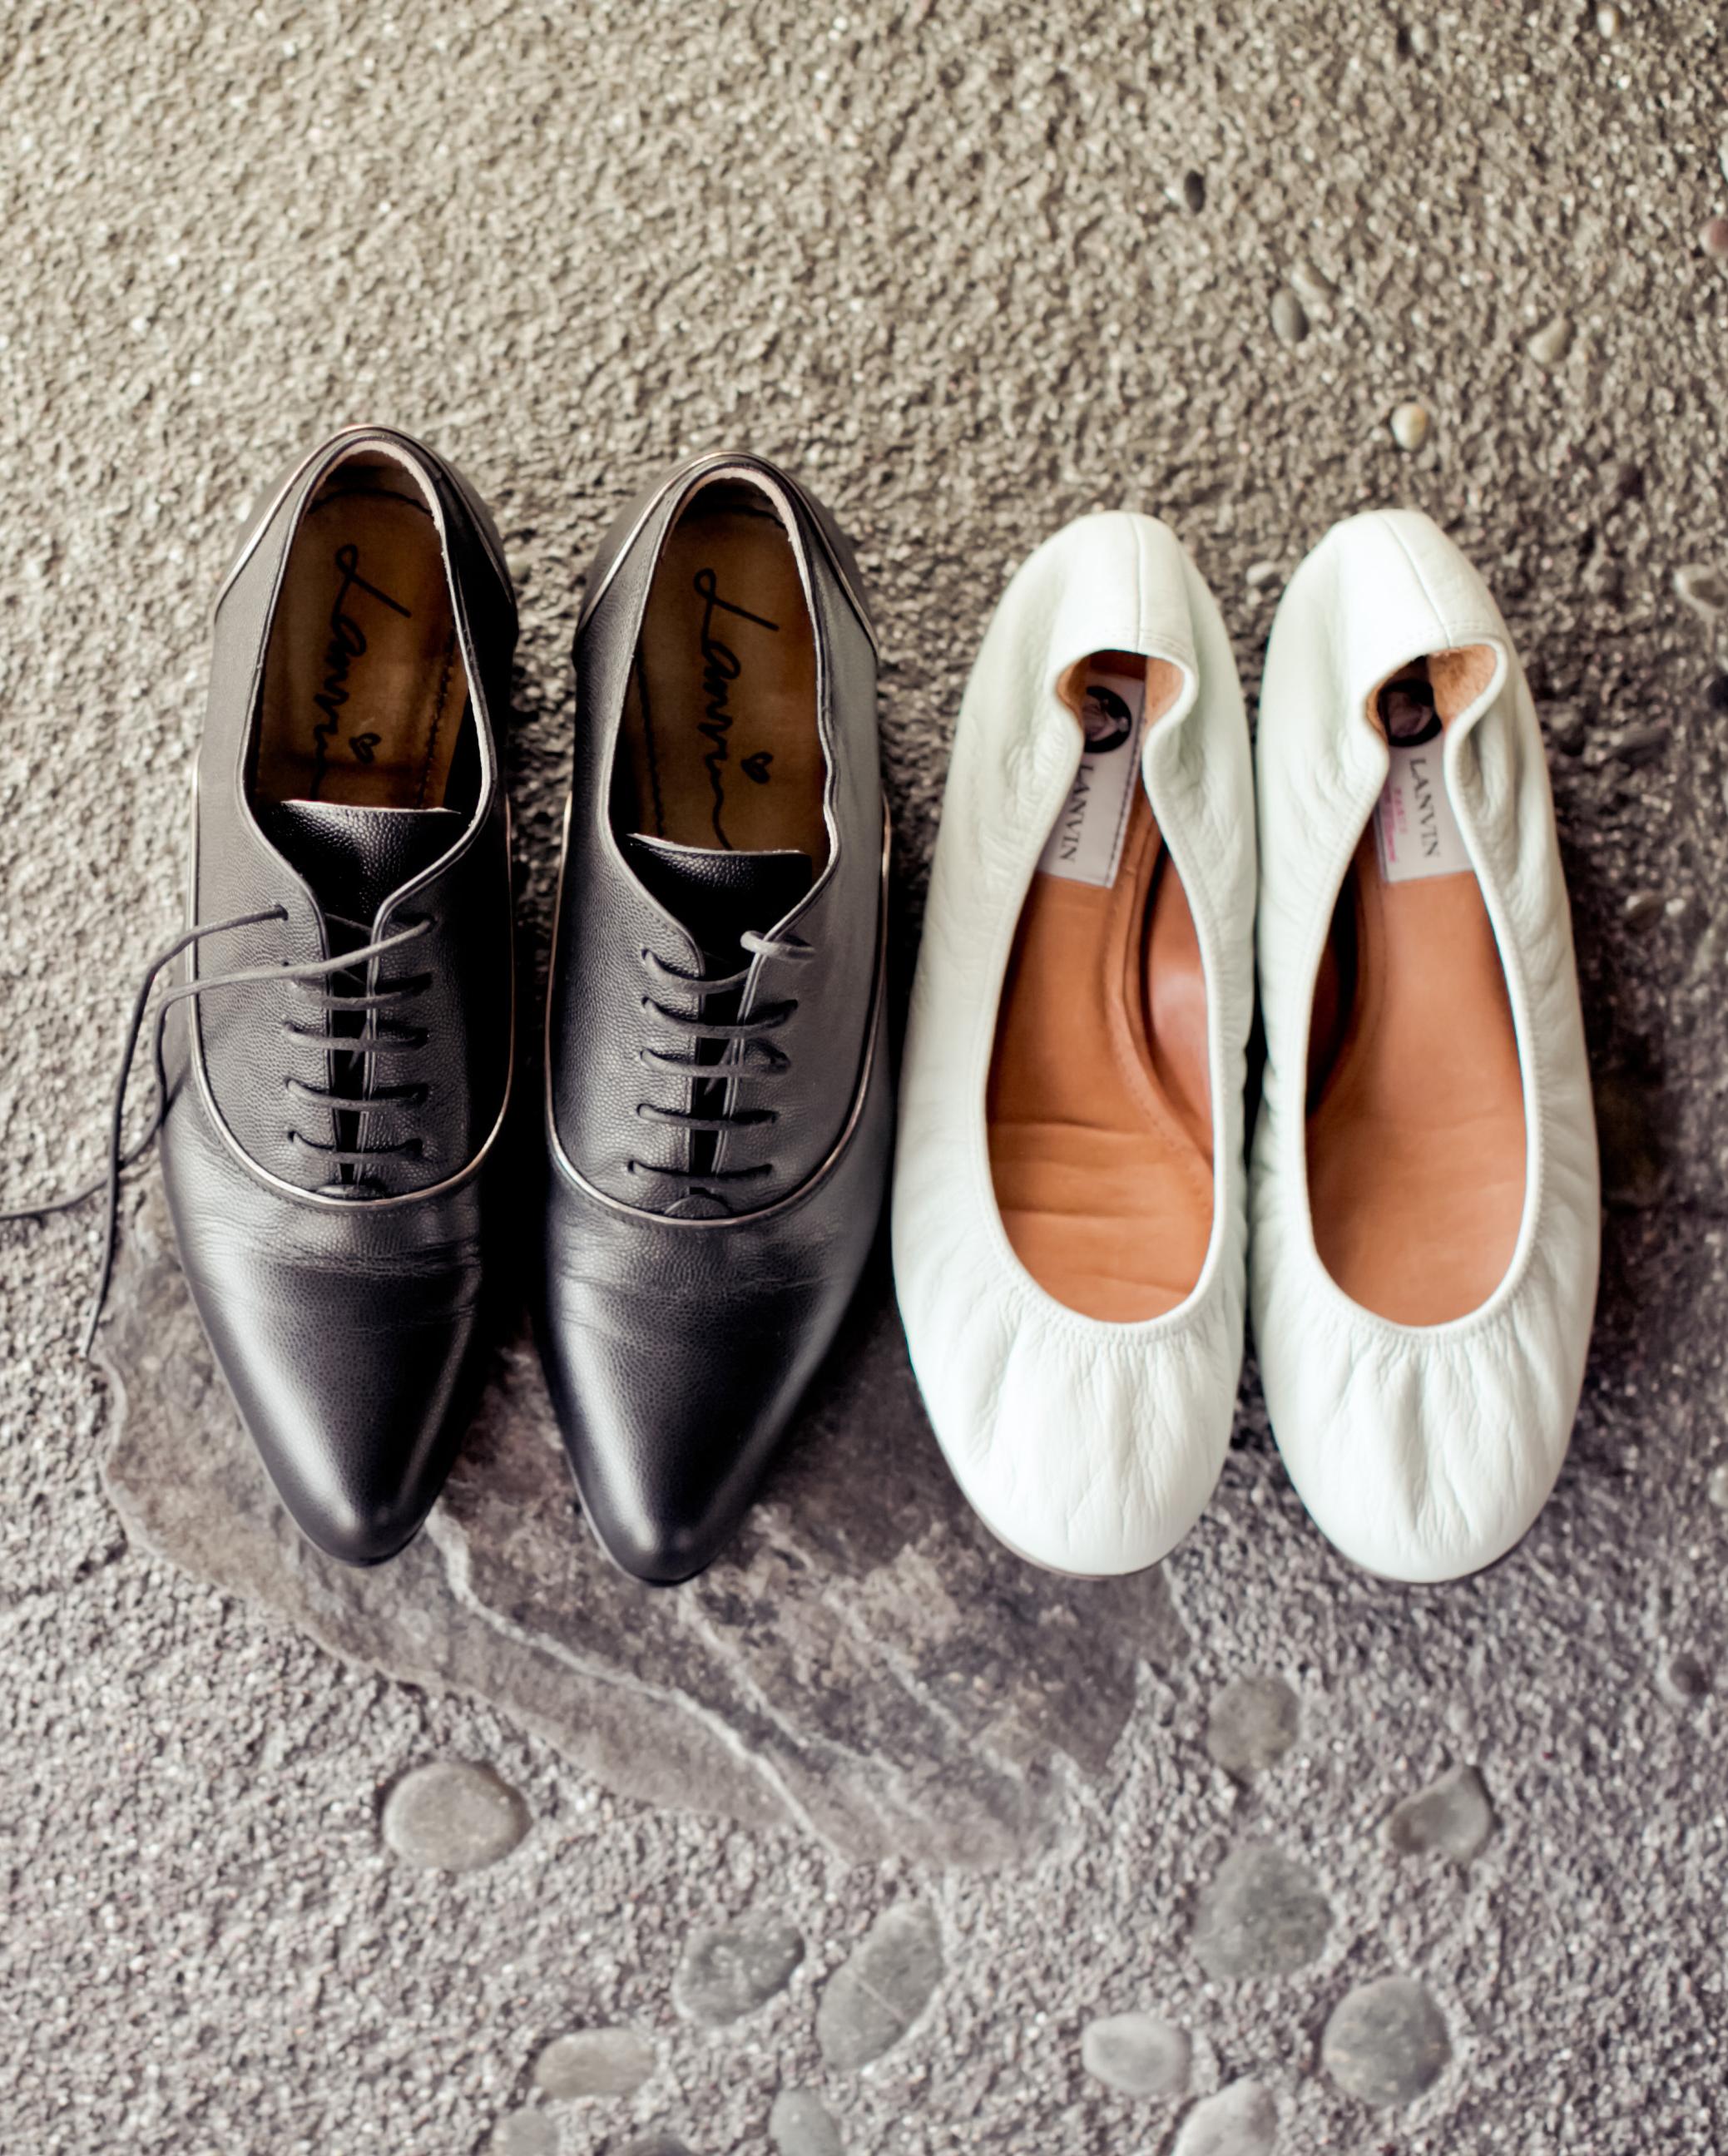 emma-michelle-wedding-shoes-0262-s112079-0715.jpg